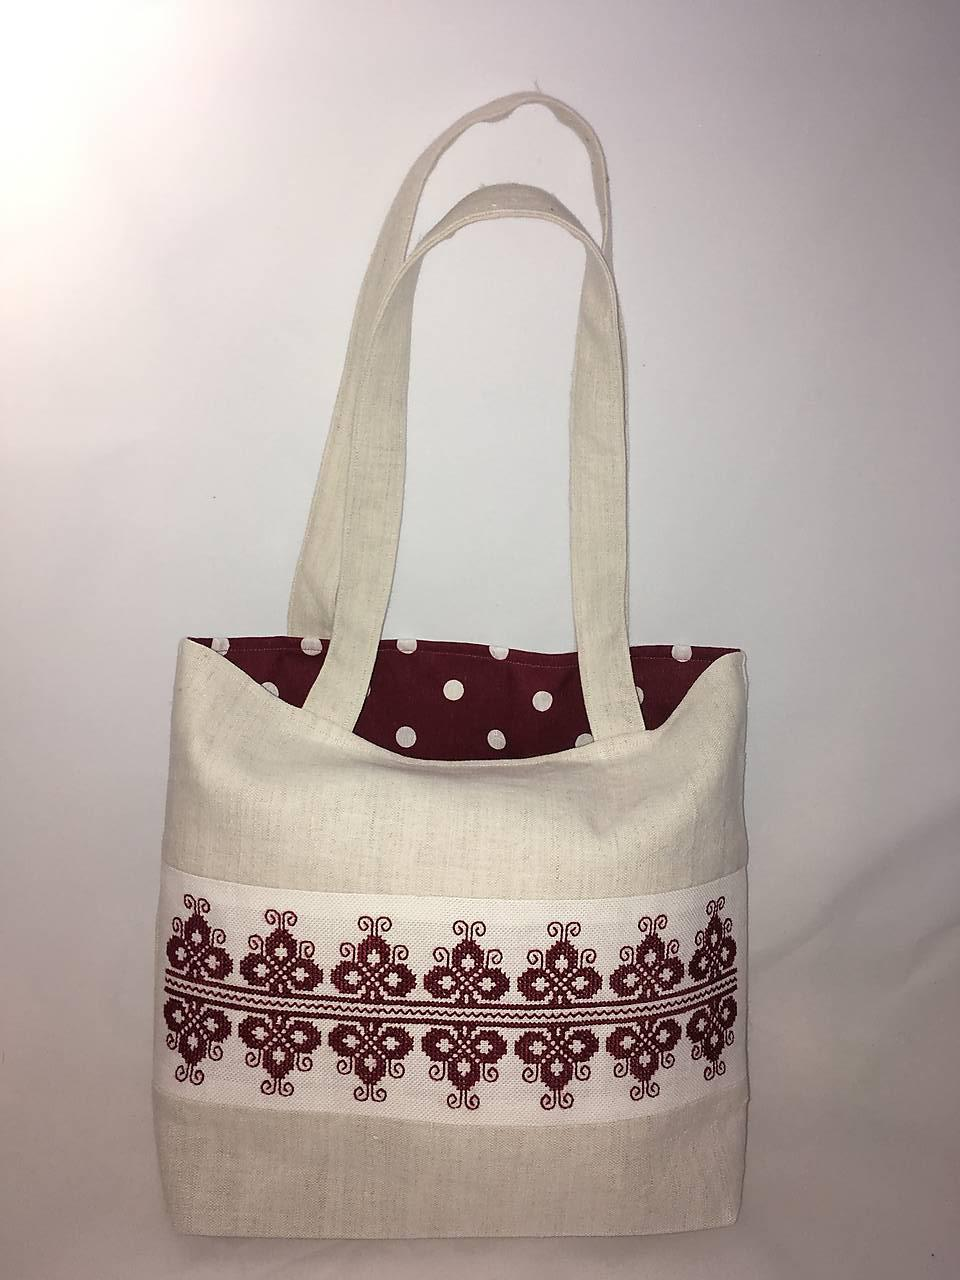 Plátenná taška s ľudovou výšivkou   TASKYODMARUSKY - SAShE.sk ... 3778a3c3534